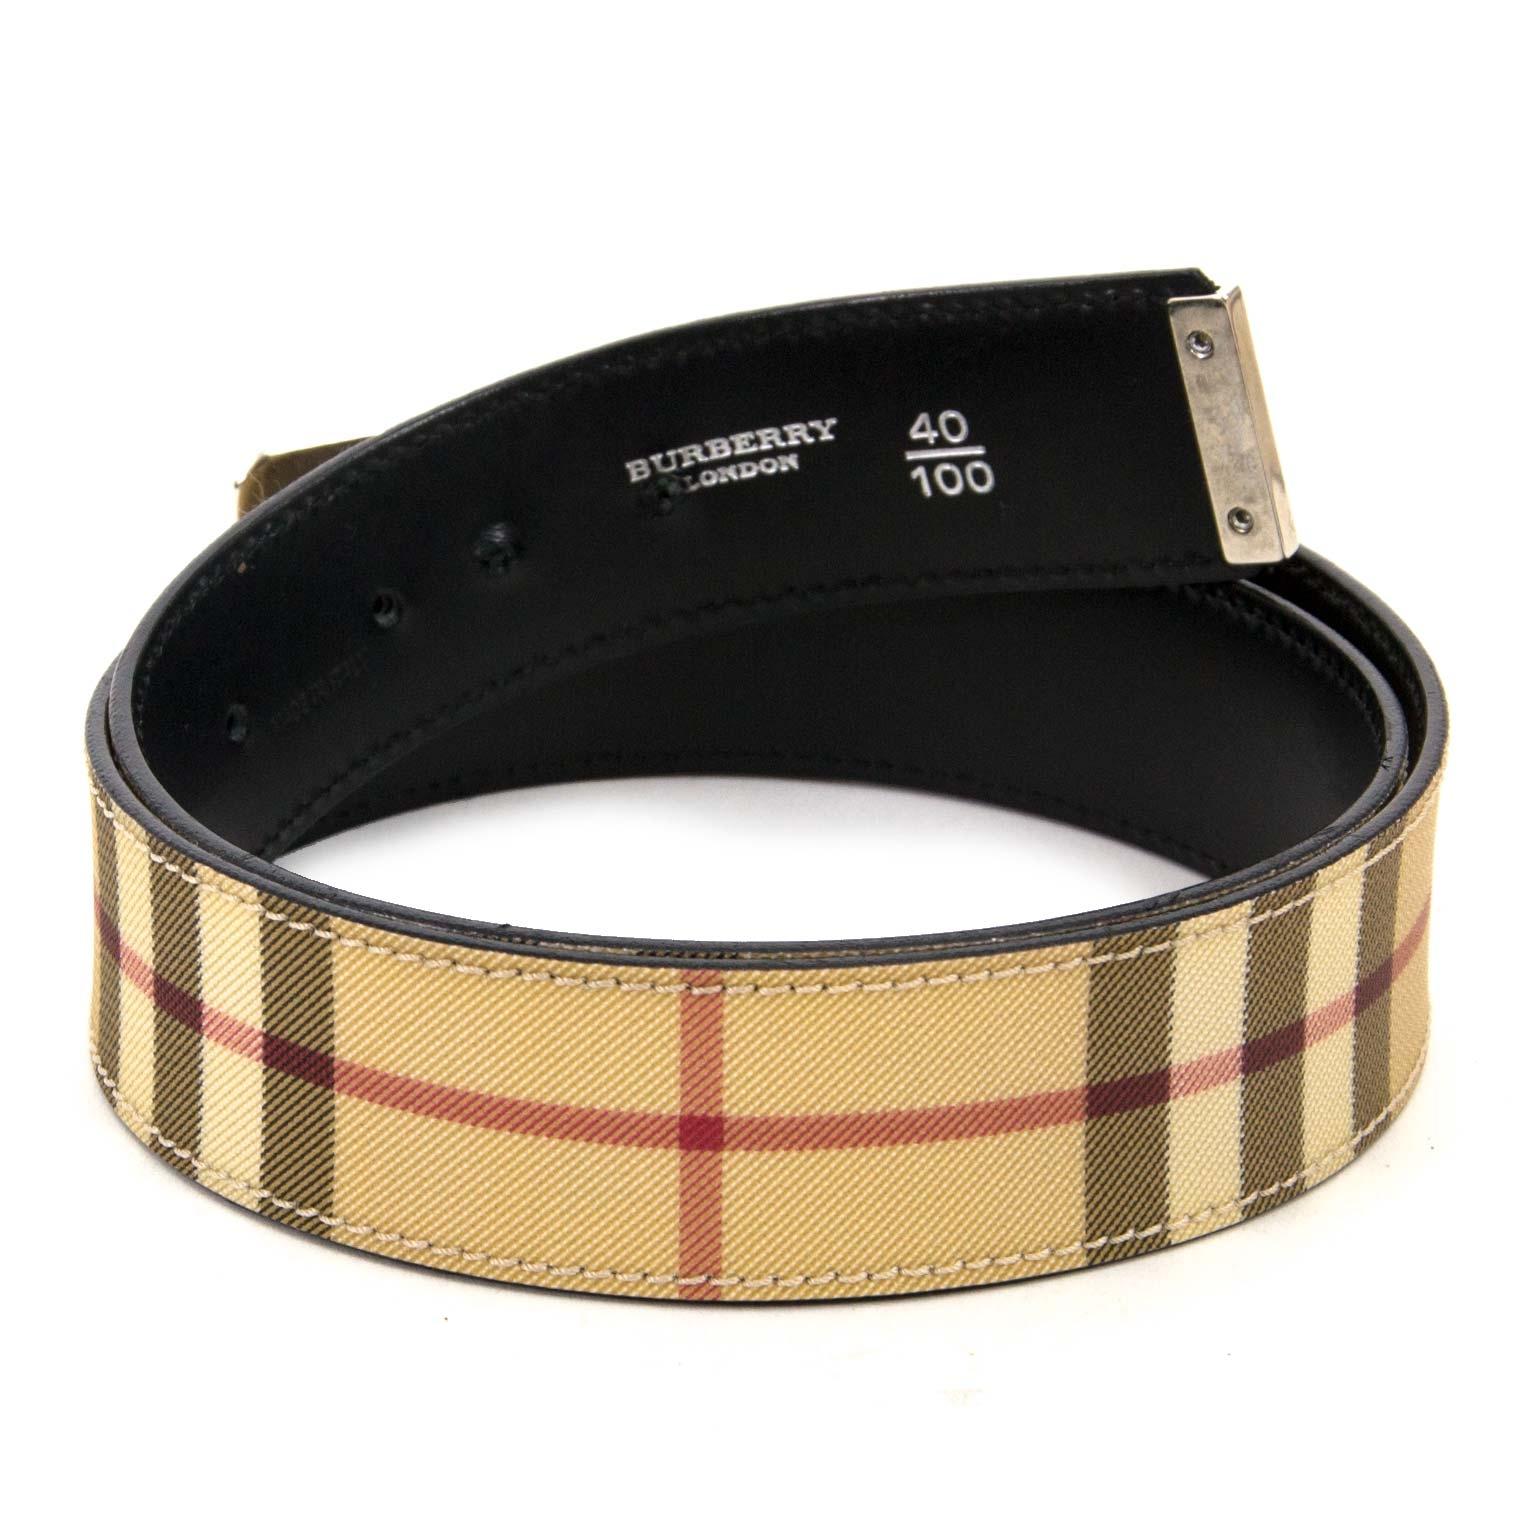 burberry beige monogram belt now for sale at labellov vintage fashion webshop belgium